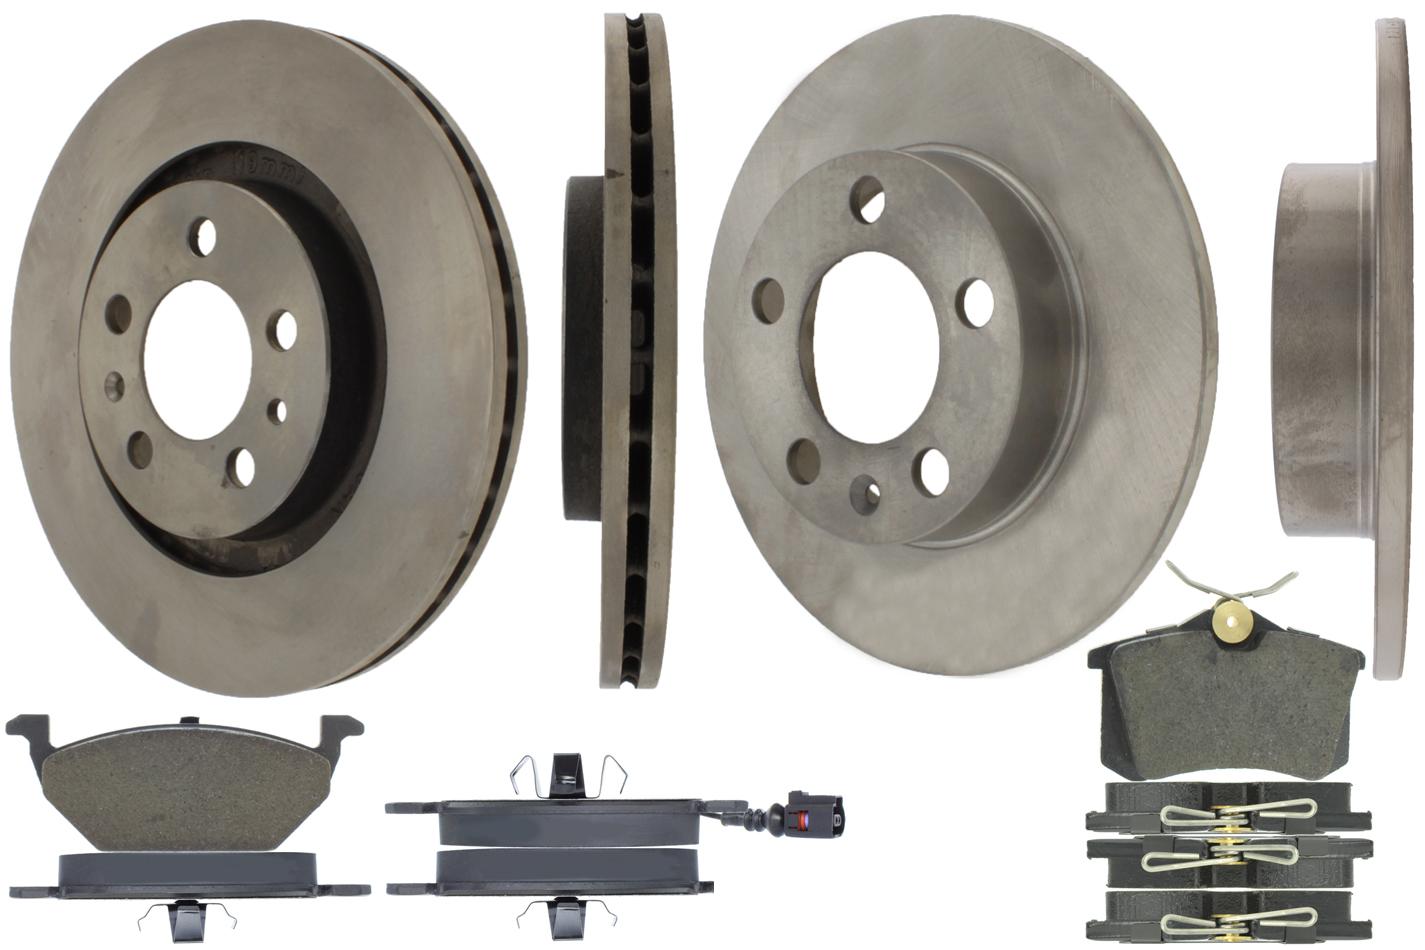 Centric Brake Parts 905.33067 Brake Rotor and Pad Kit, Premium, Semi-Metallic Pads, Iron, Natural, Volkswagen Beetle / Golf / Jetta 1999-2010, Kit